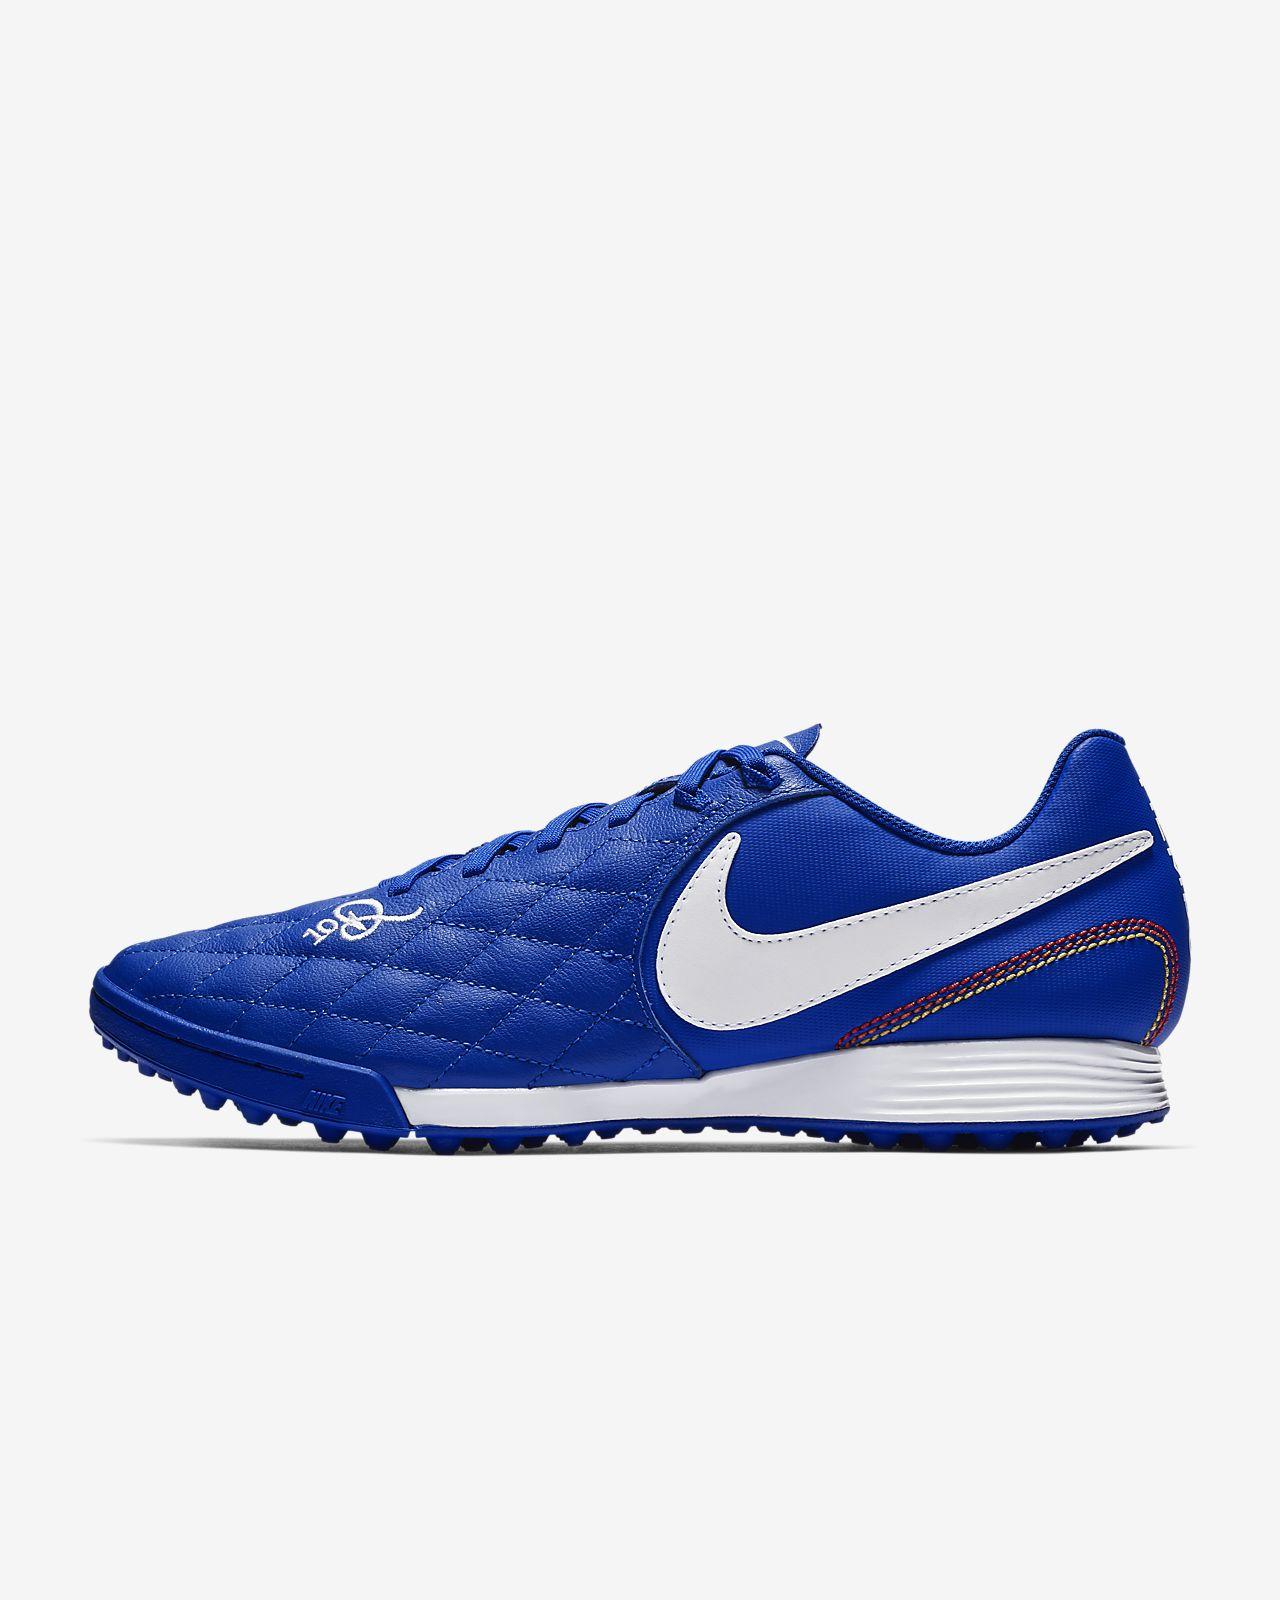 Nike TiempoX Legend VII Academy 10R Turf Football Shoe